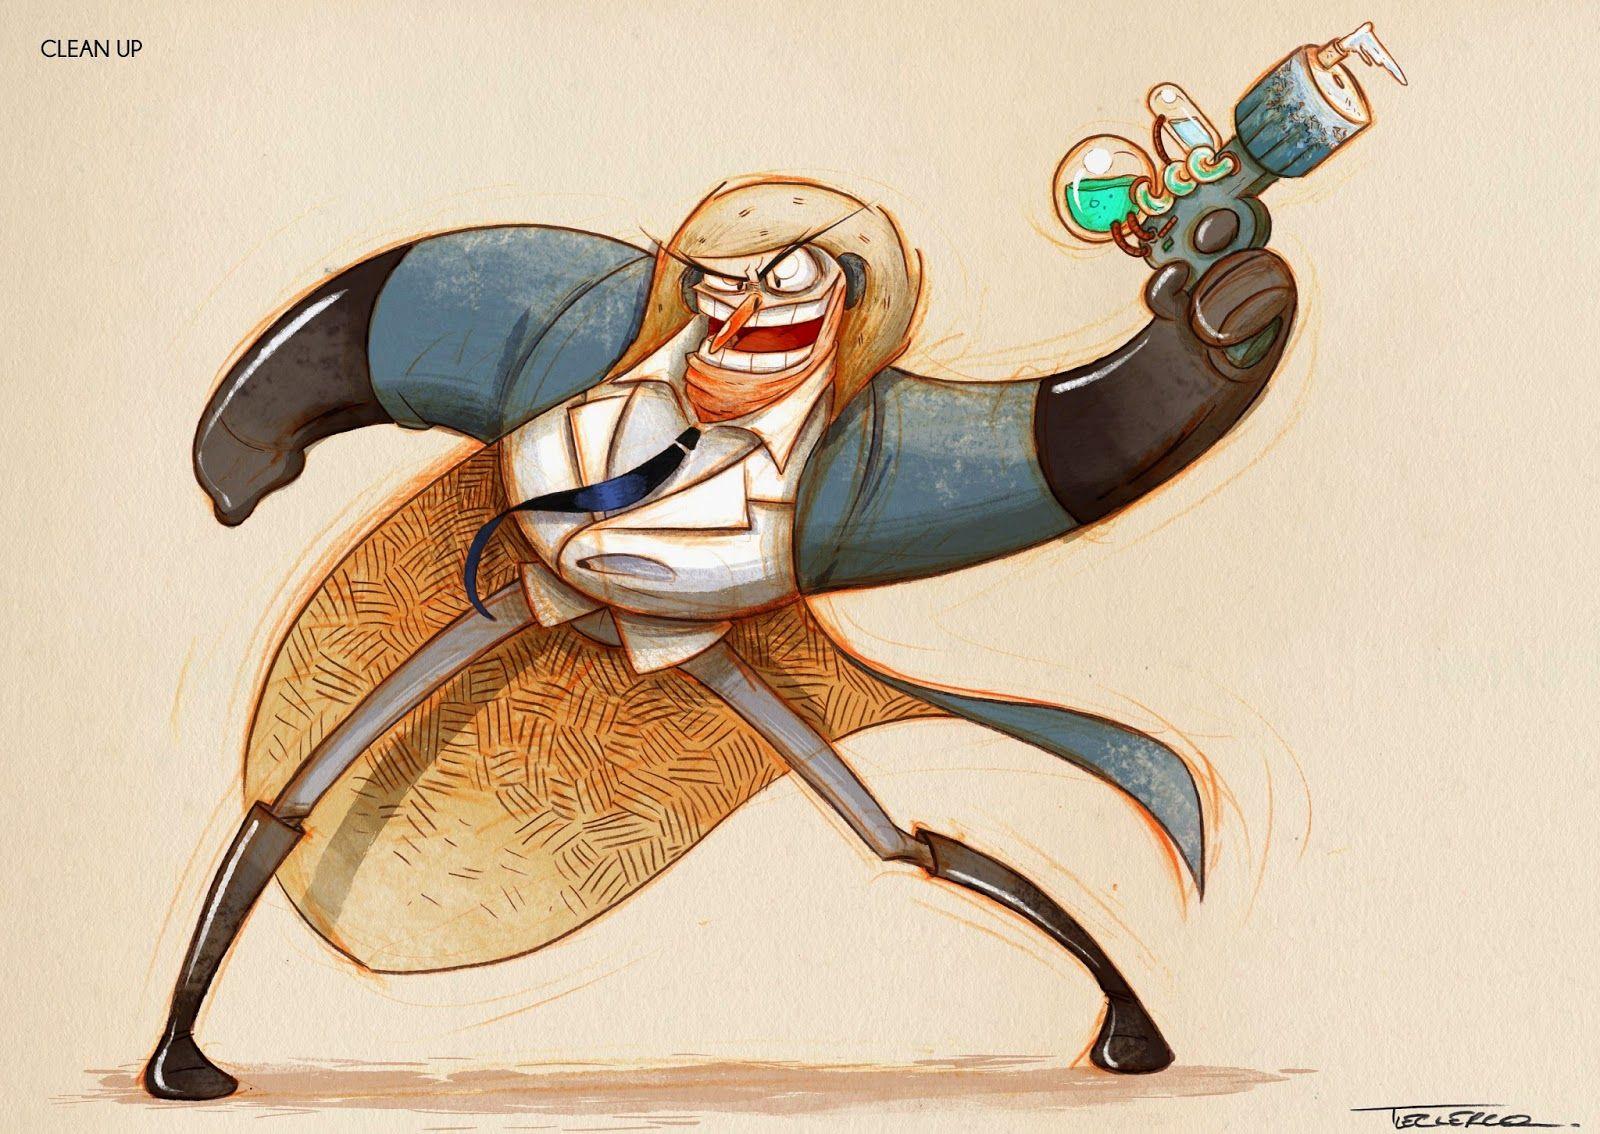 Character Design Inspiration Tumblr : Thibault leclercq thibaultleclercq tumblr my toony